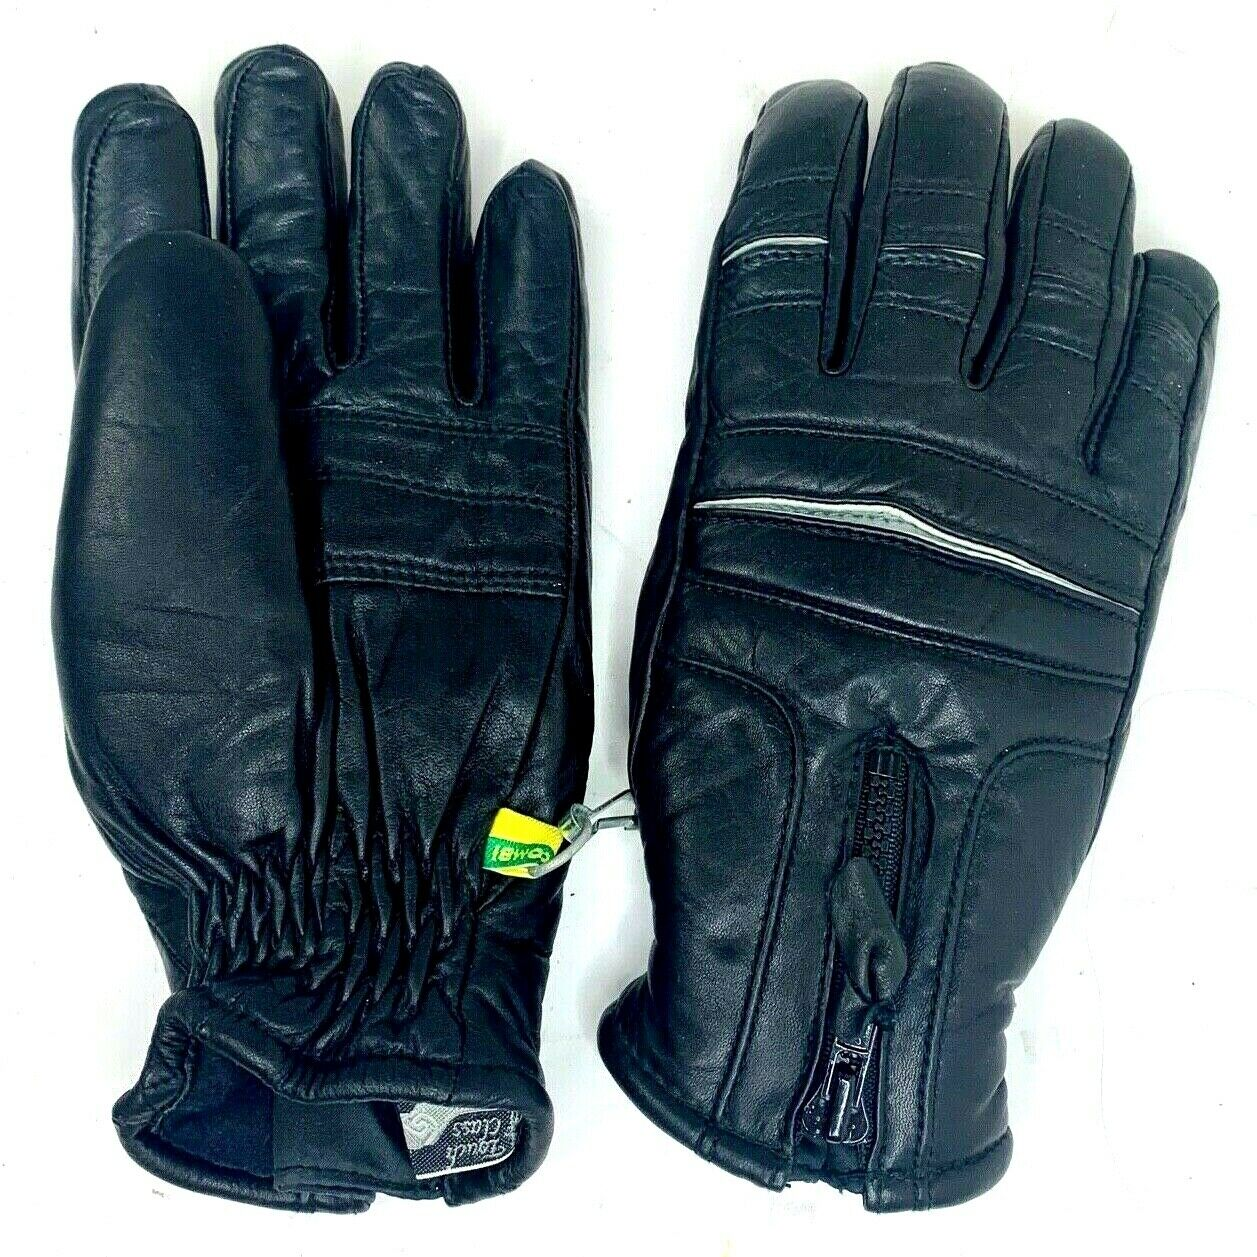 Vtg Kombi Mens Winter Gloves Black Leather Insulated Zip Closure Sport Outdoor S